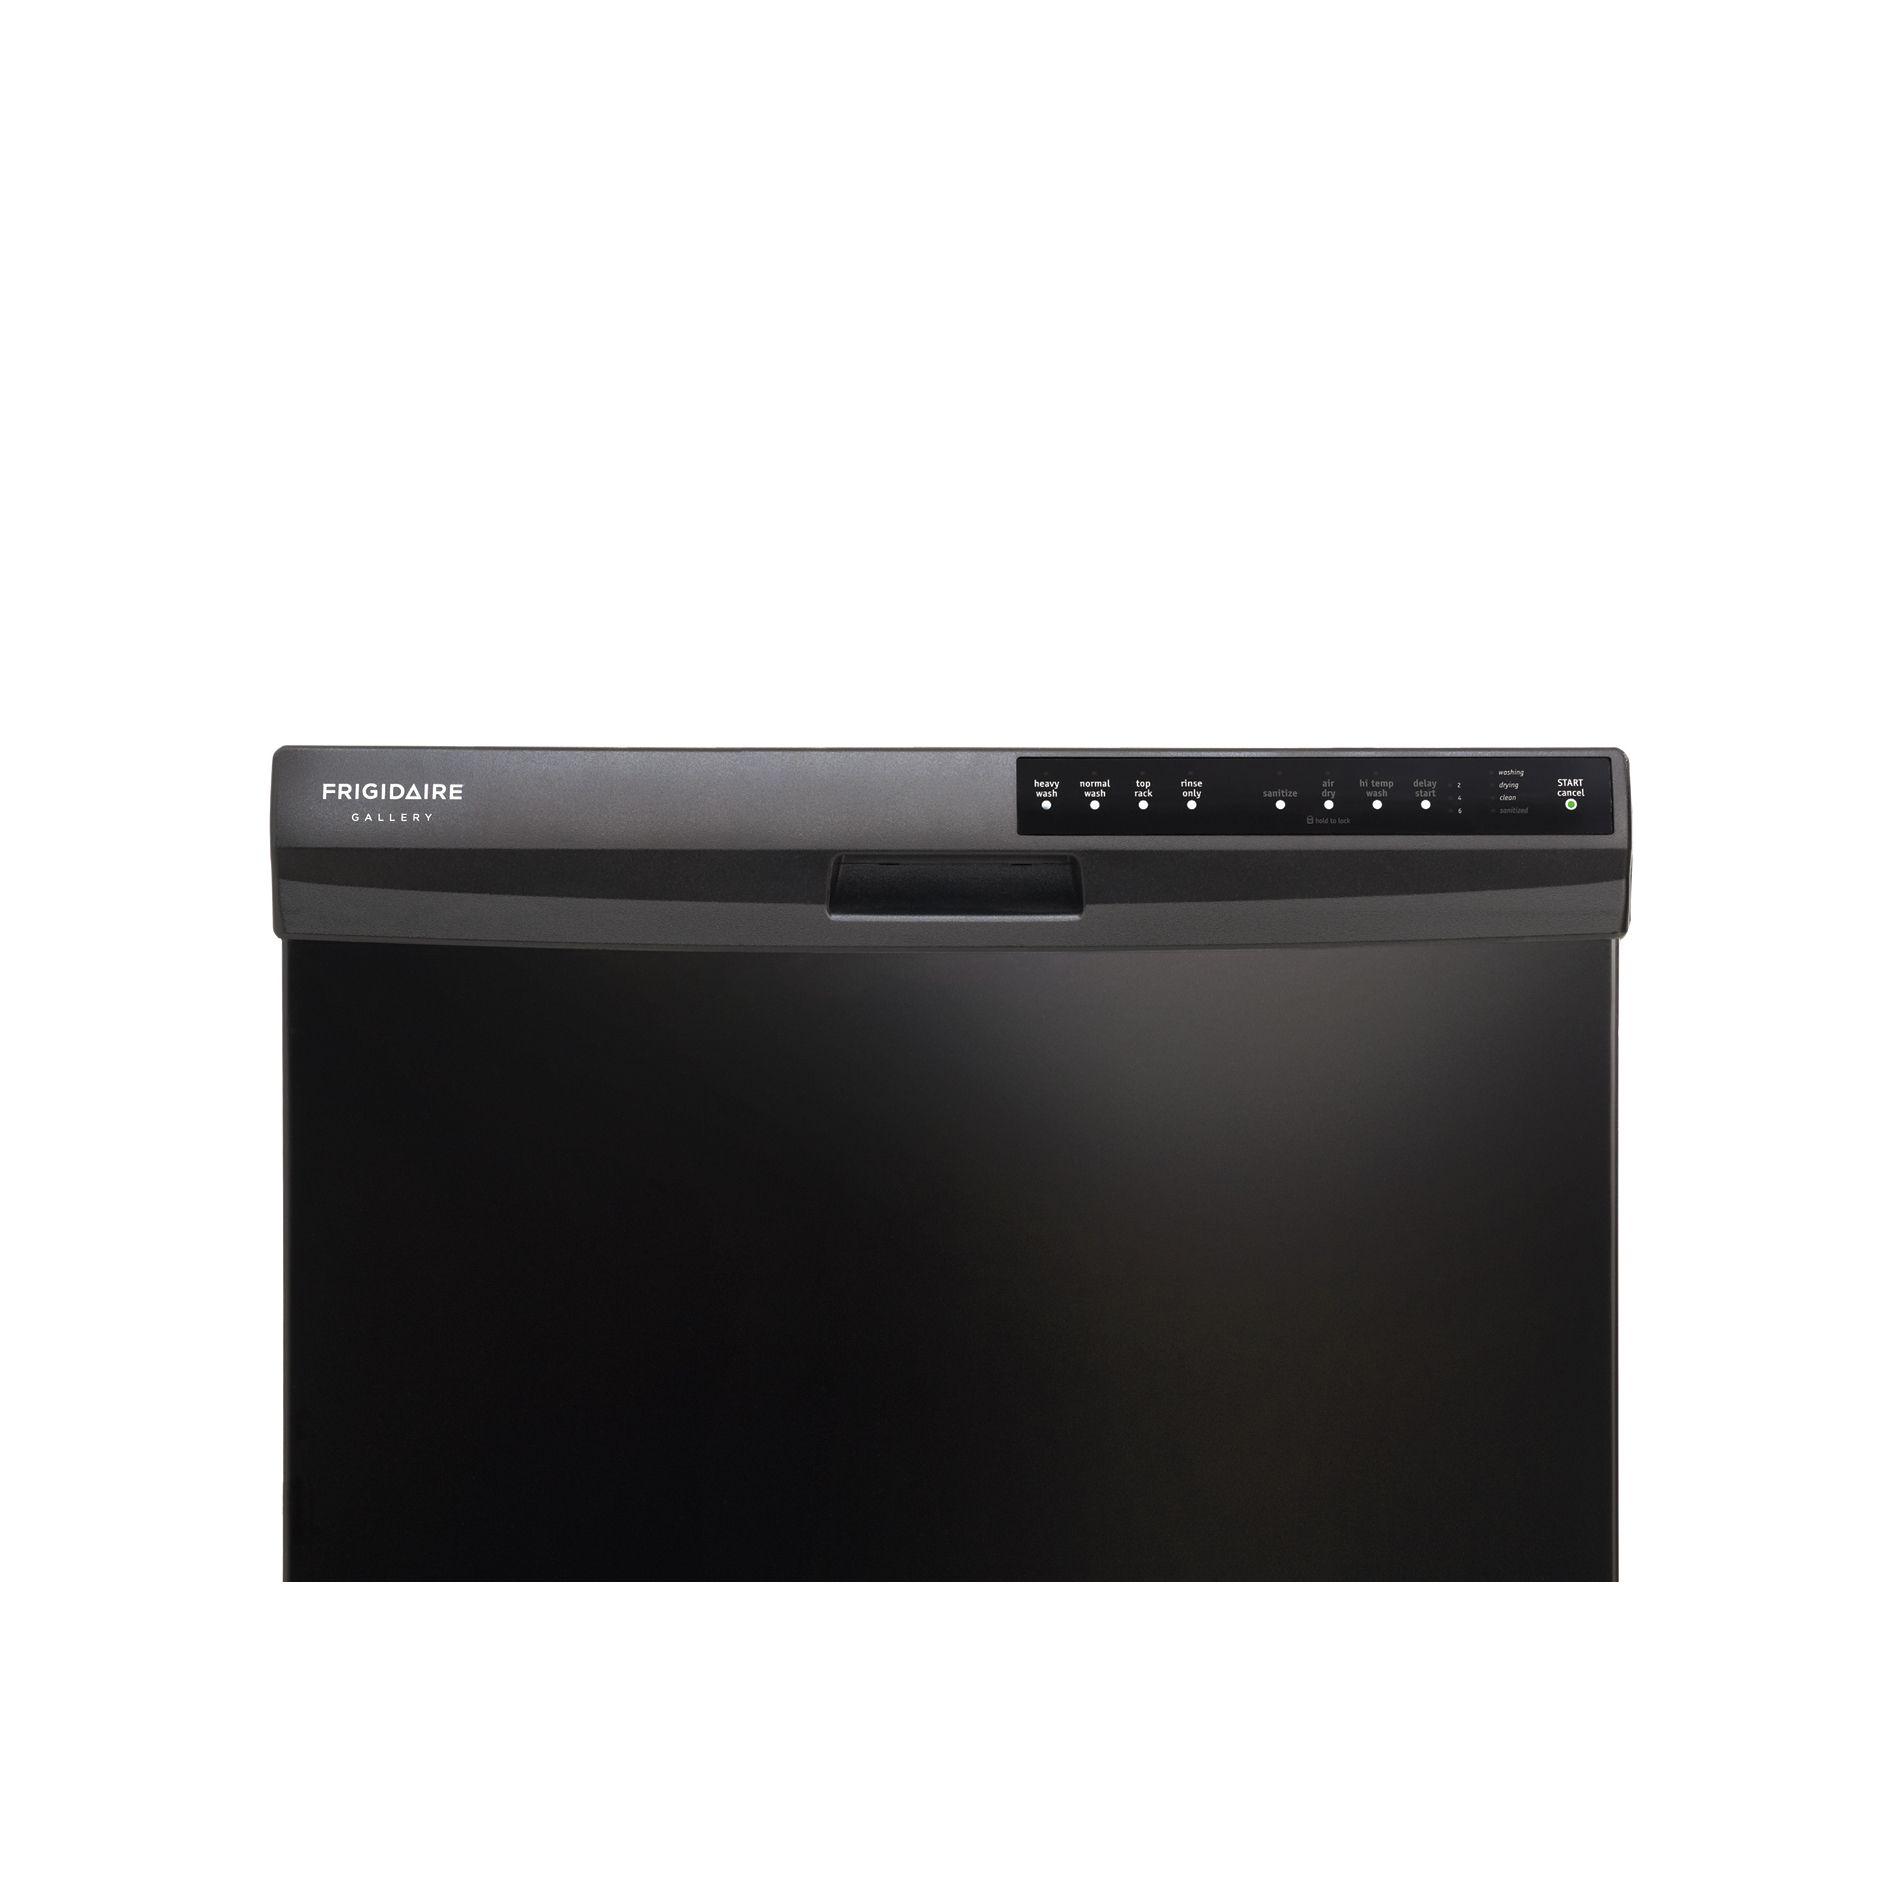 "Frigidaire 24"" Built-In Dishwasher - Black"